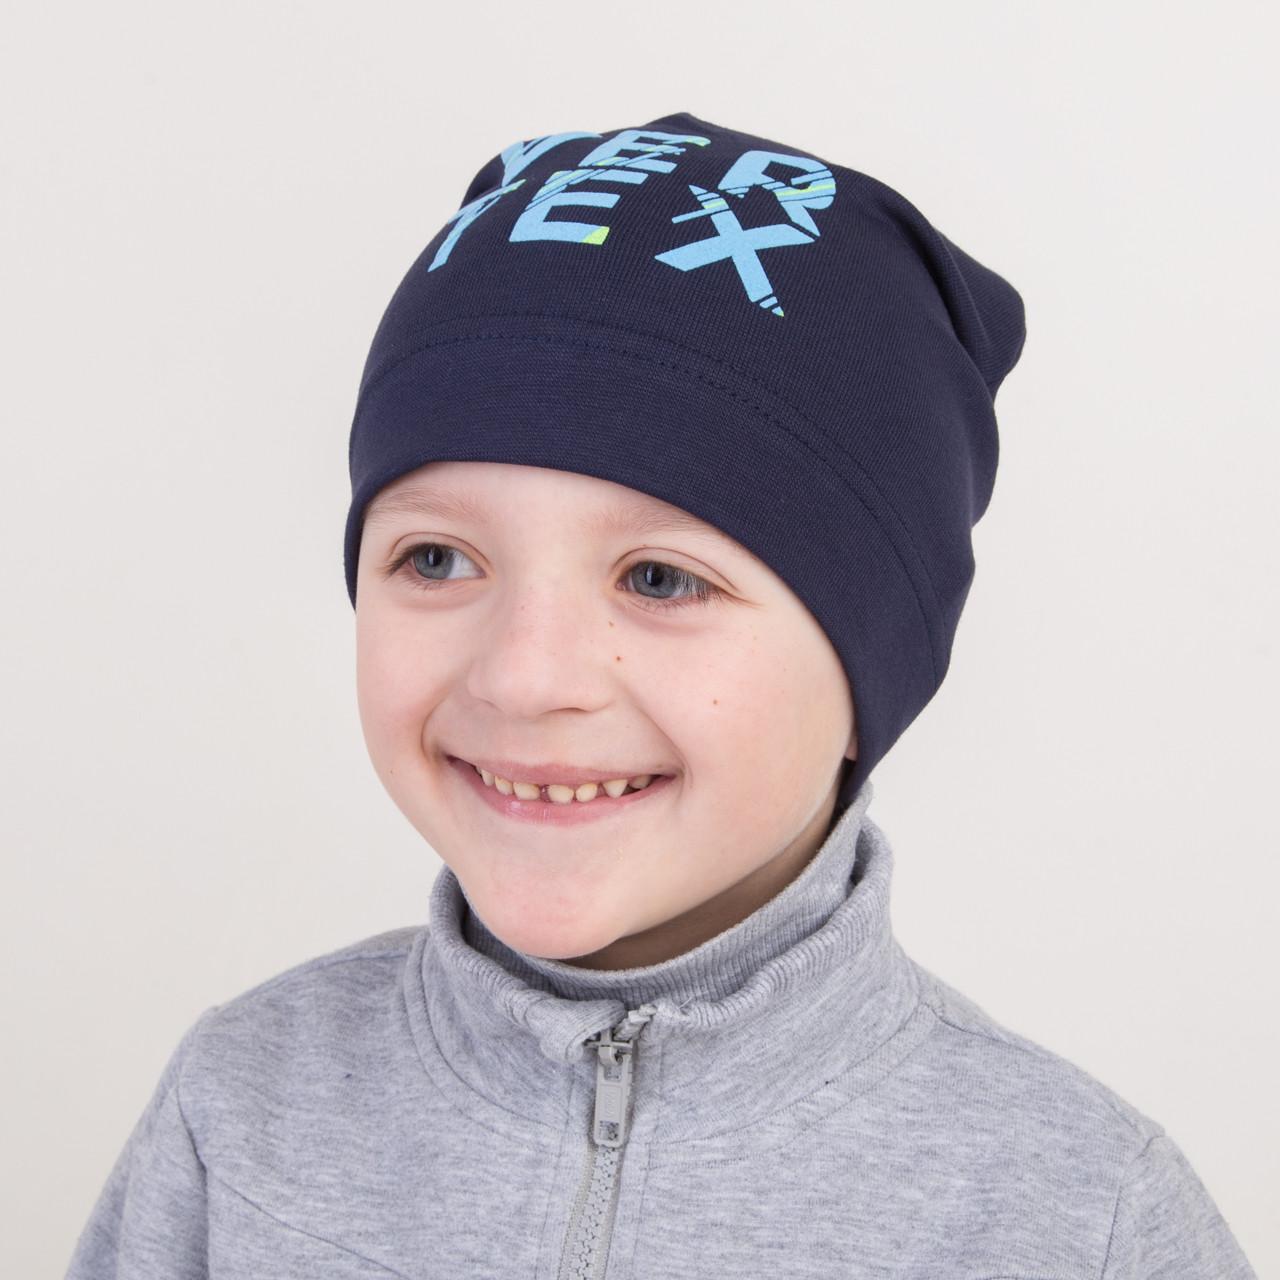 Весенняя хлопковая шапка для мальчика оптом - Артикул 2273